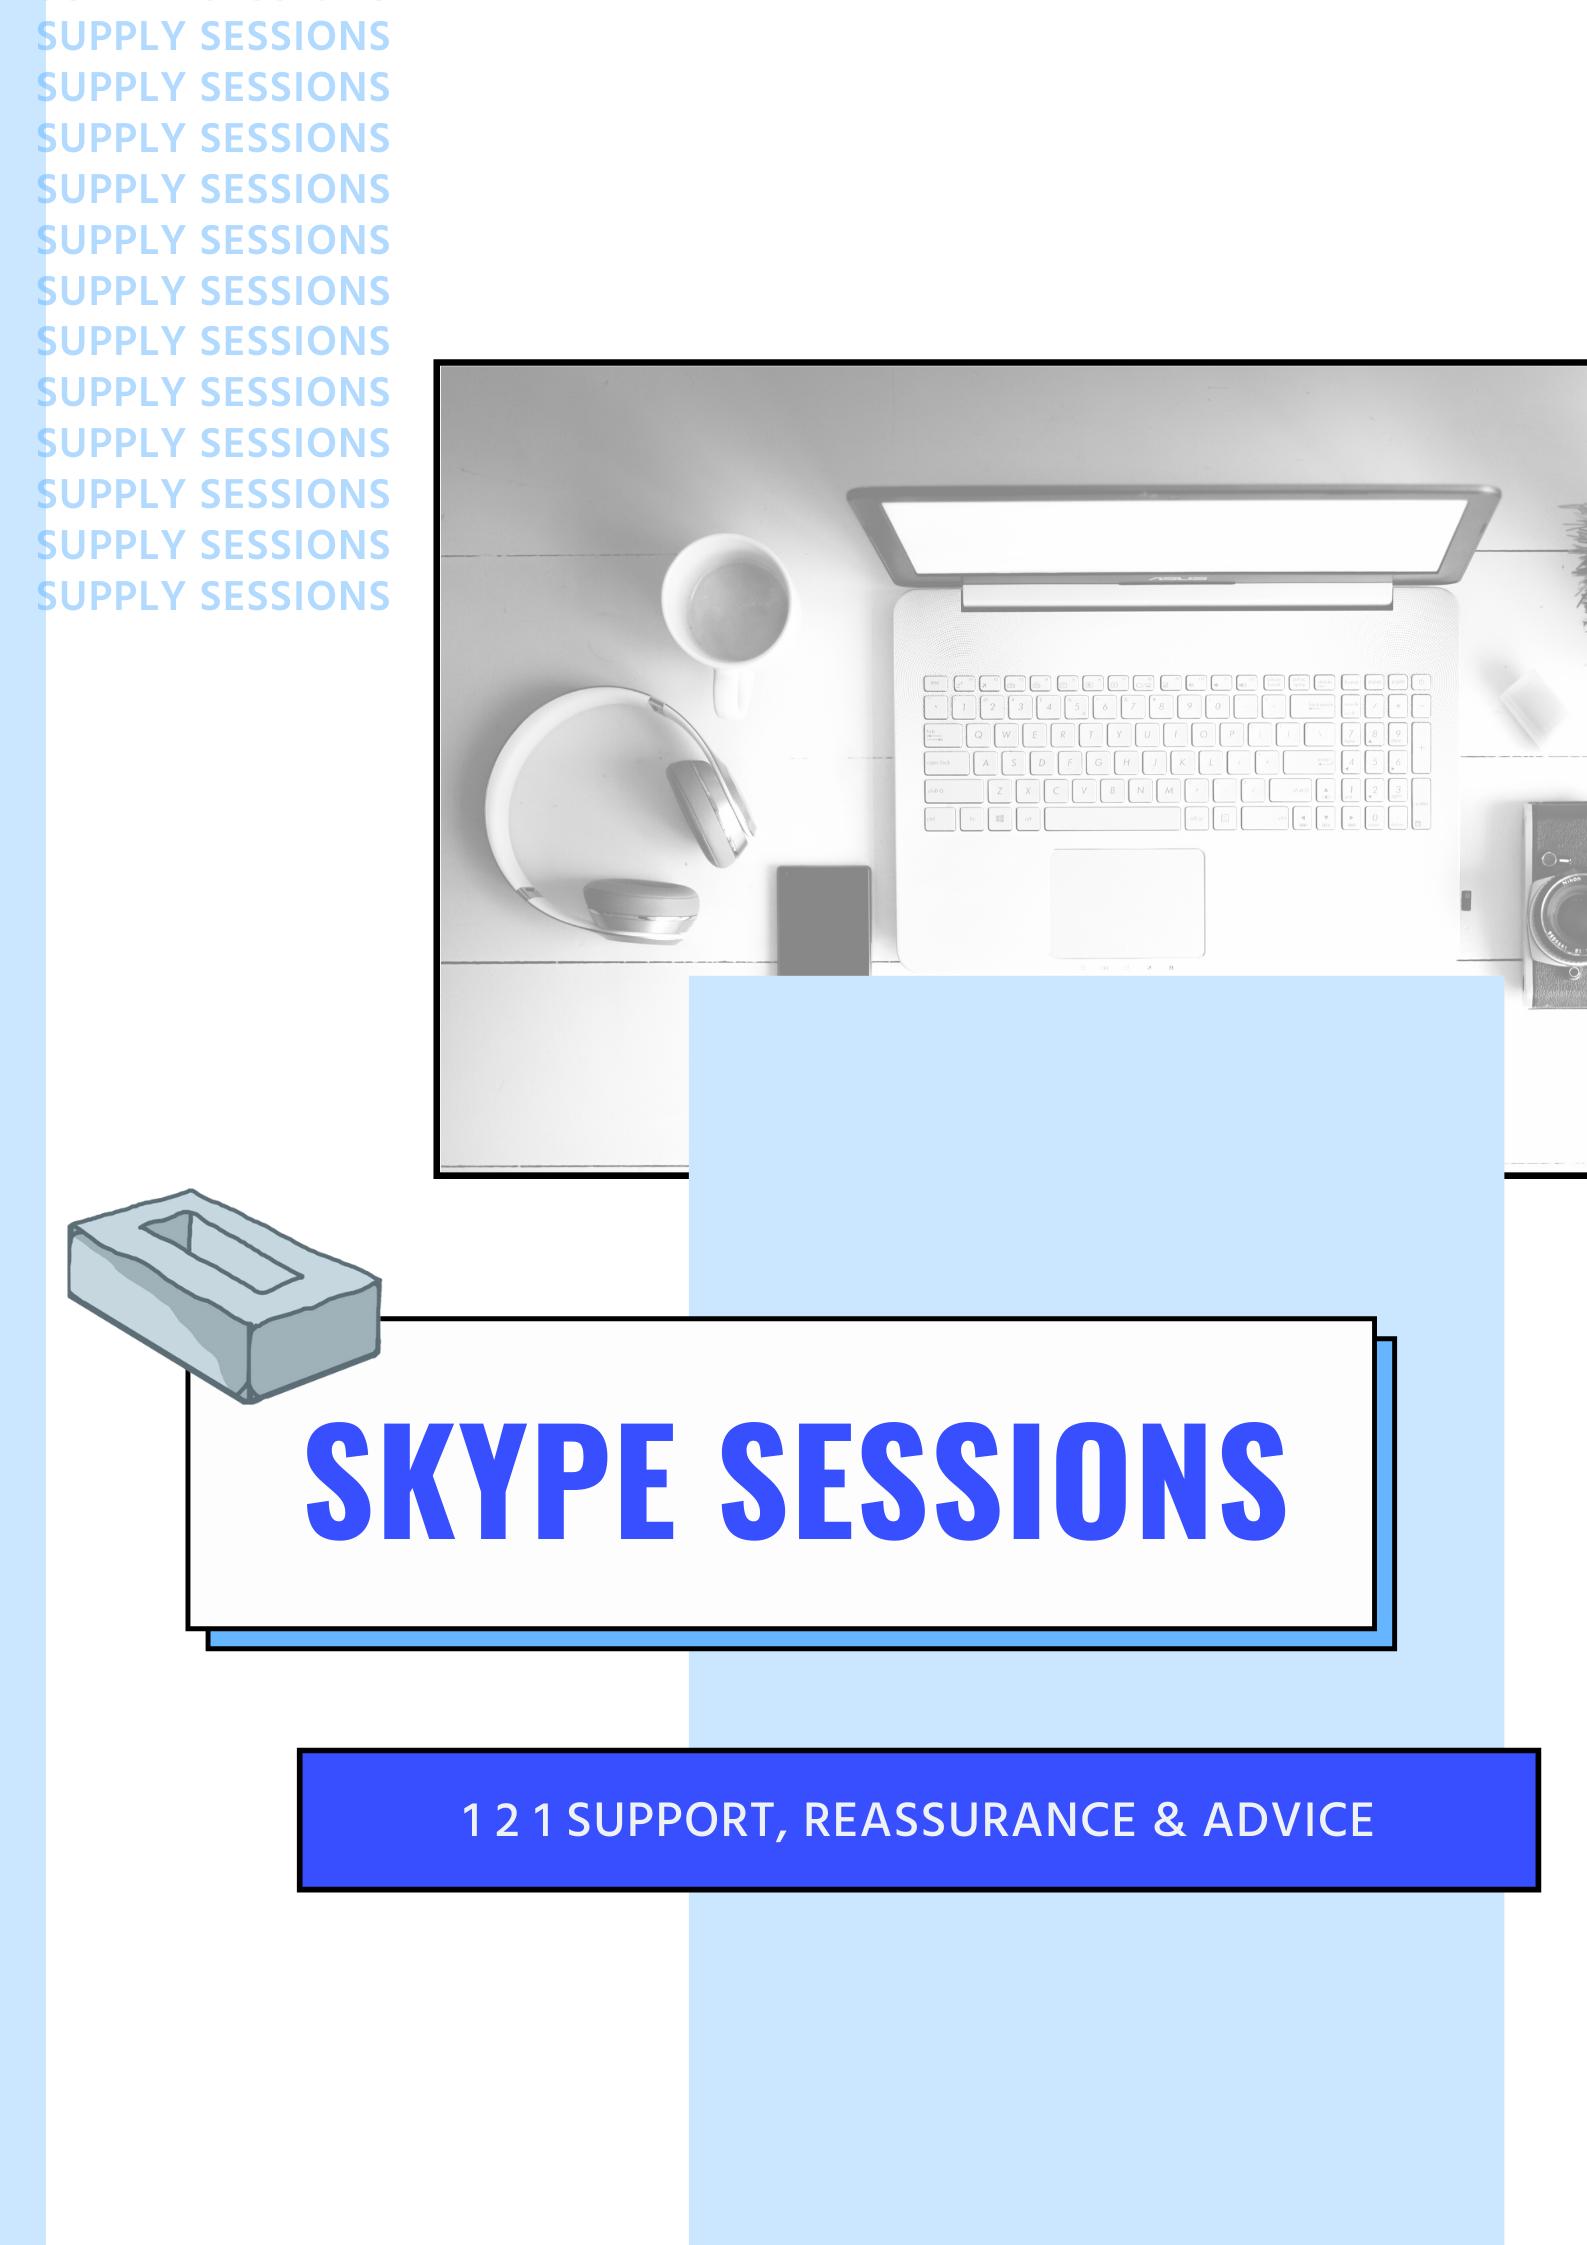 Skype Session Poster